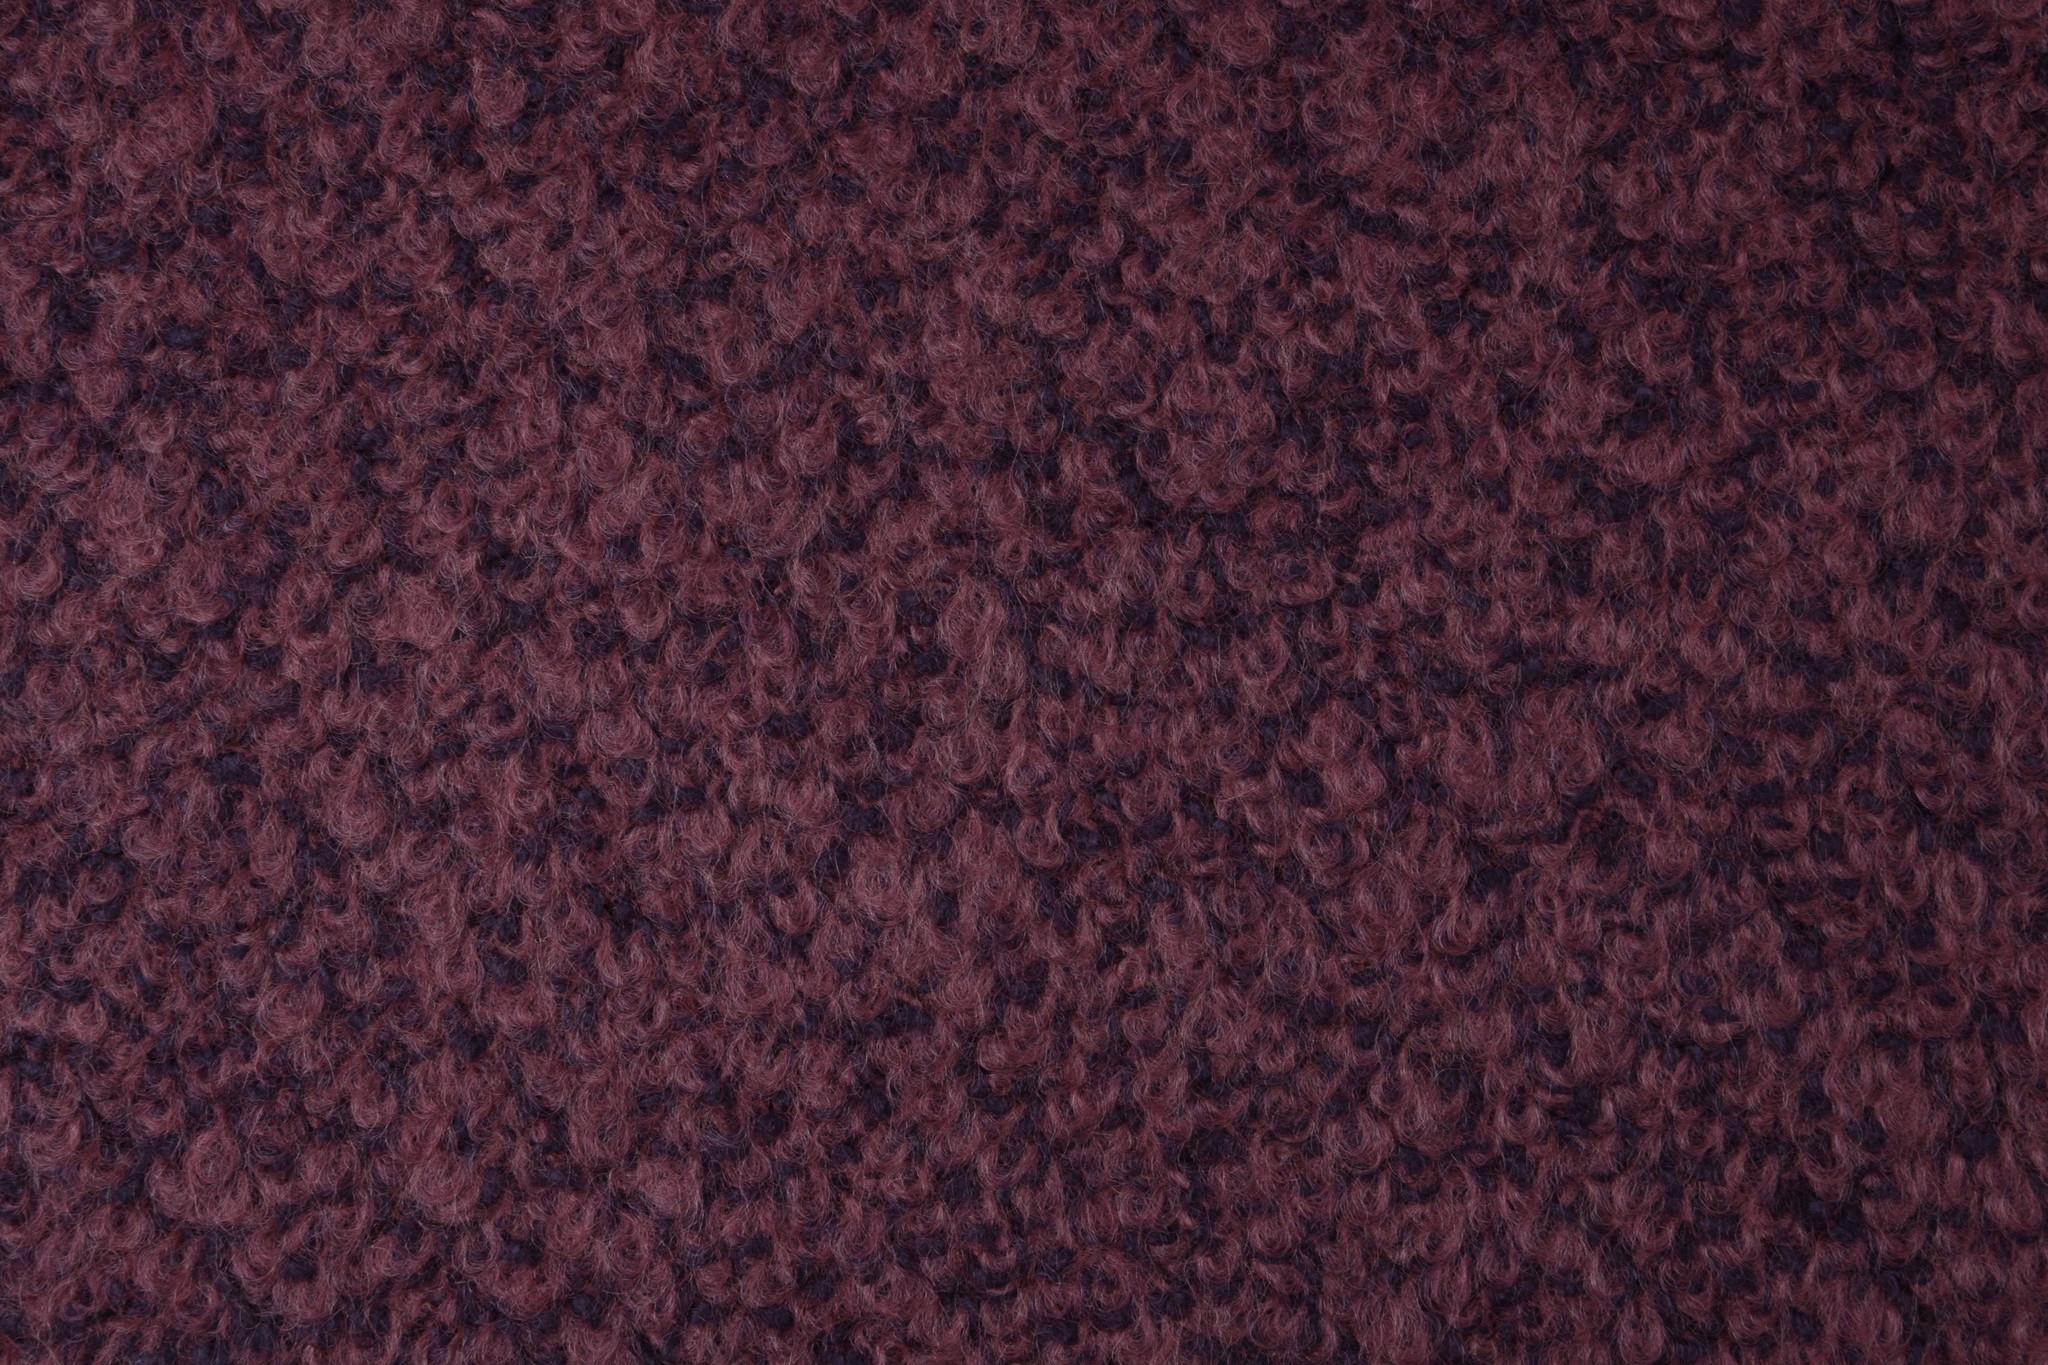 Gebreide Wollen stof Lana Oud Roze Paars